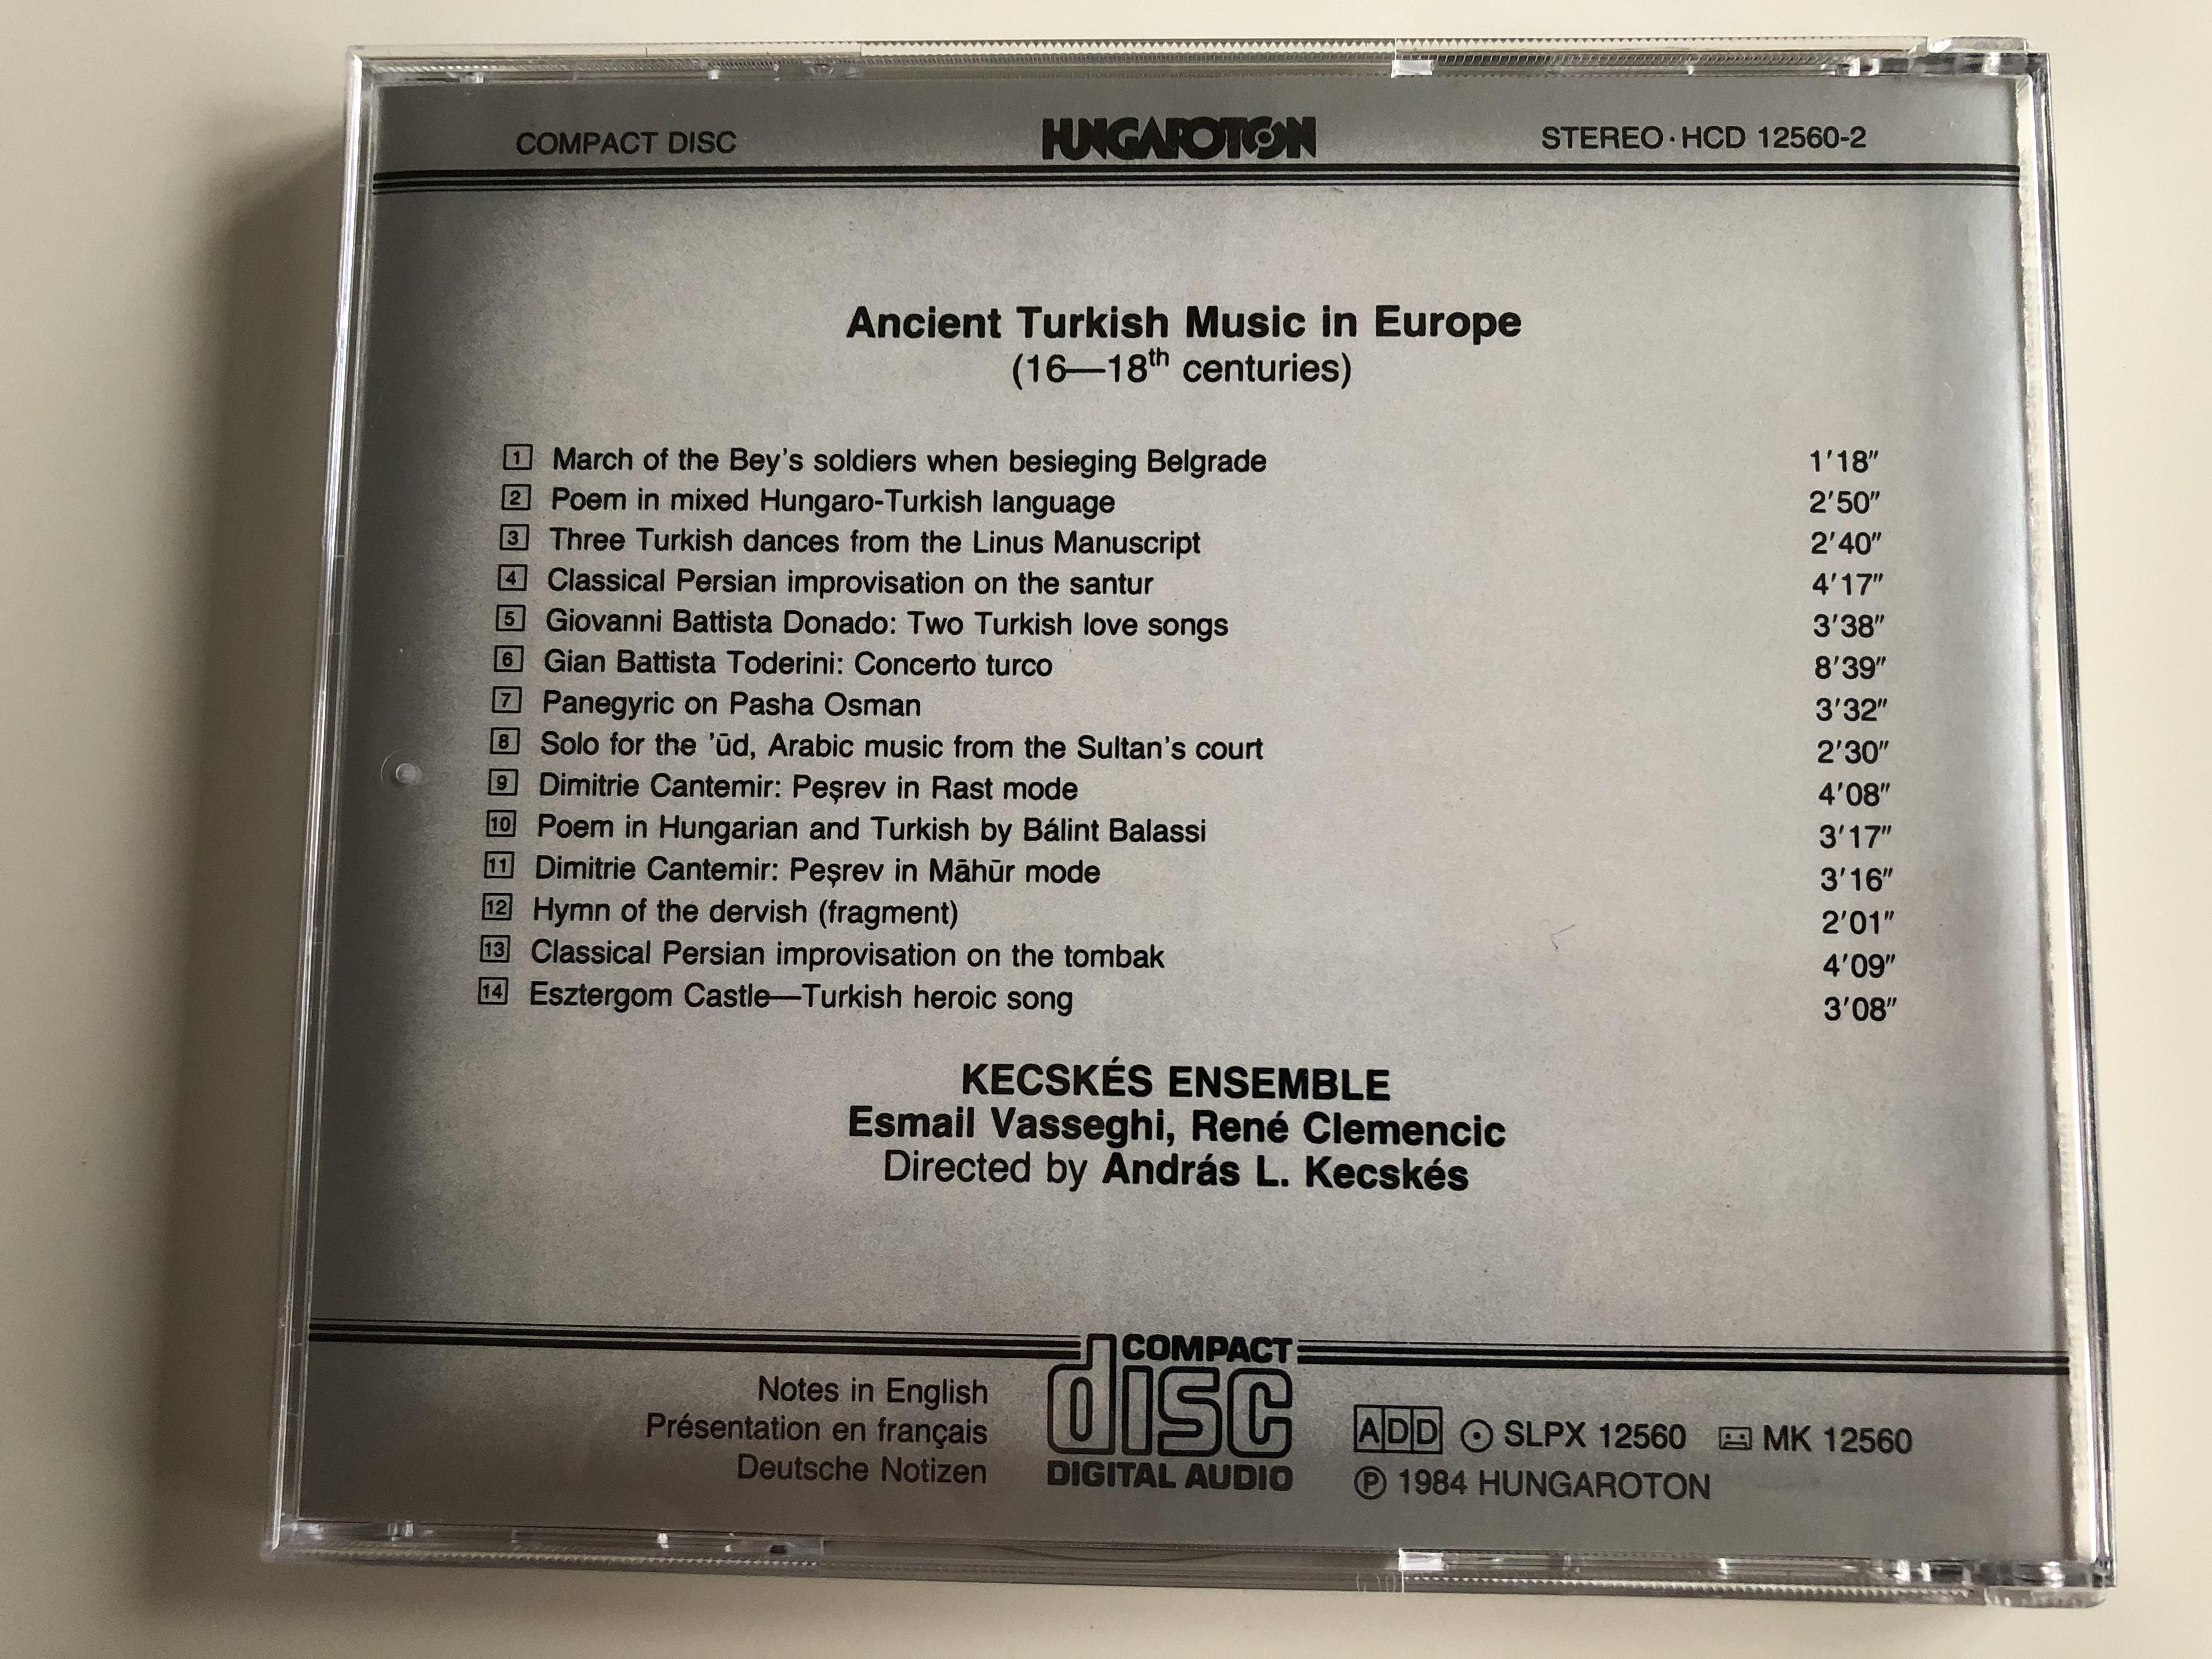 ancient-turkish-music-in-europe-kecsk-s-ensemble-hungaroton-audio-cd-1984-stereo-hcd-12560-2-9-.jpg